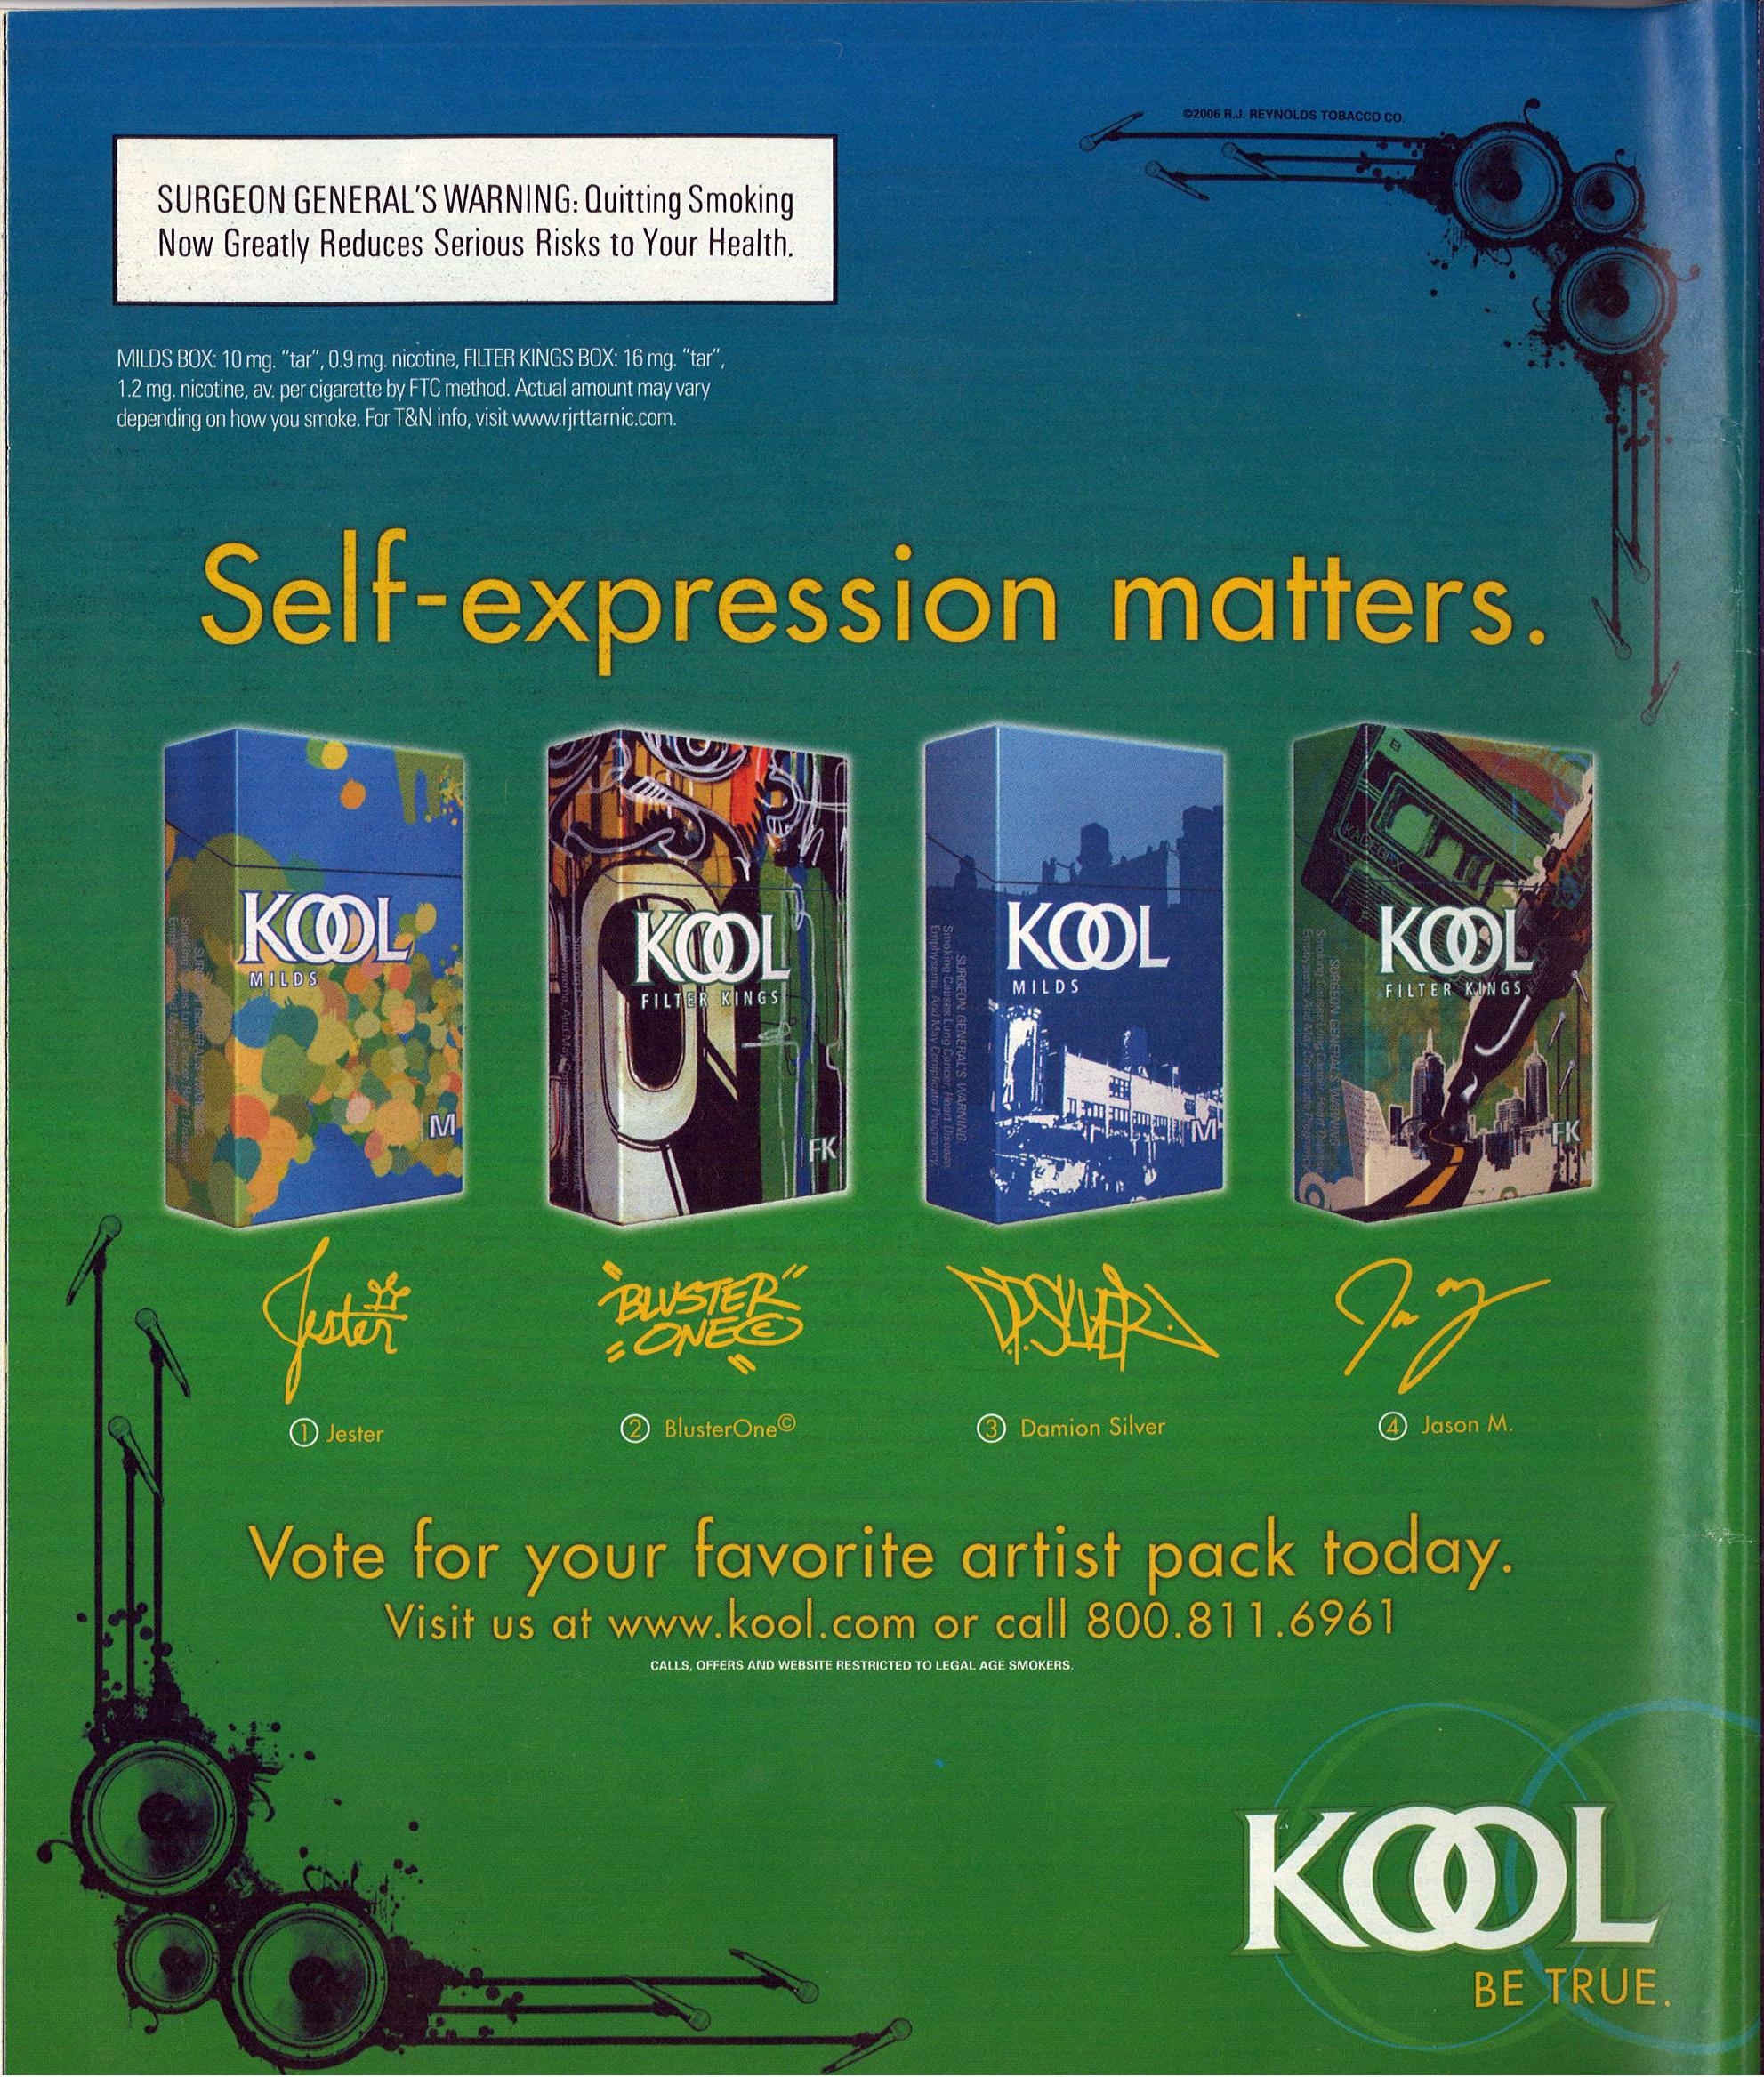 2006 03 09 Rolling Stone Kool Ad Self Expression Matters